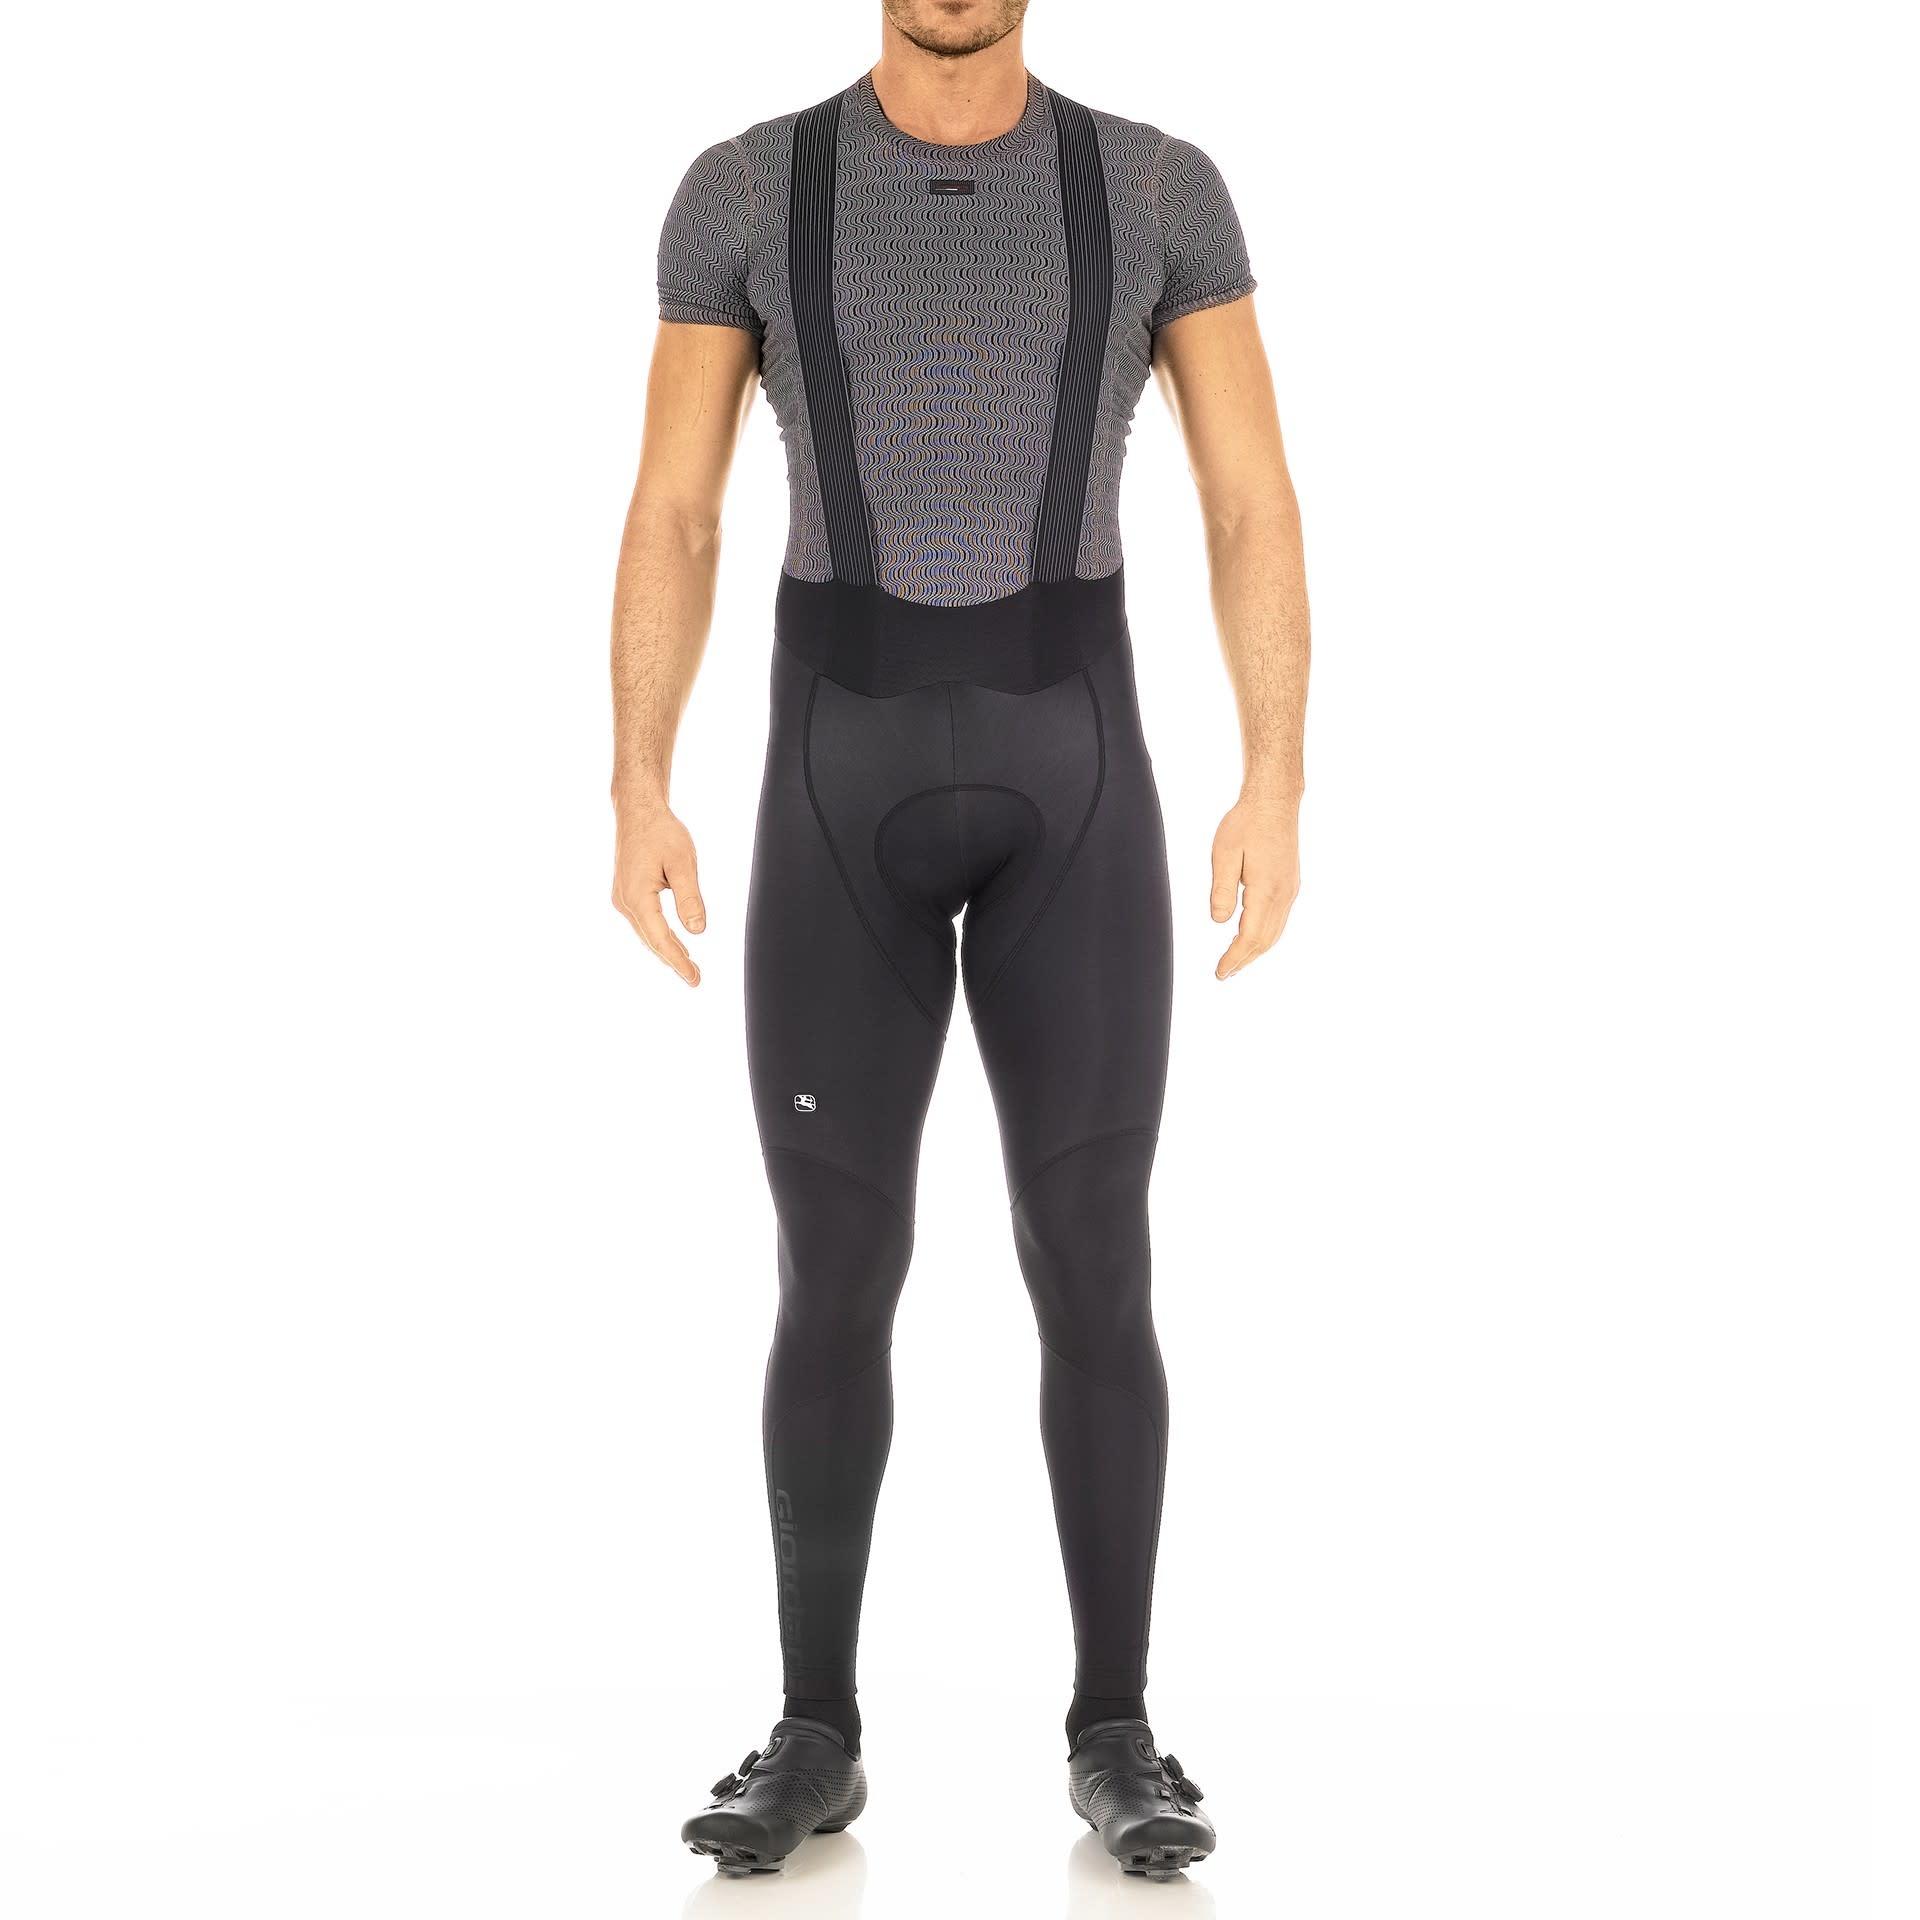 Giordana Giordana FRC Pro thermal bib tights Black 2XL